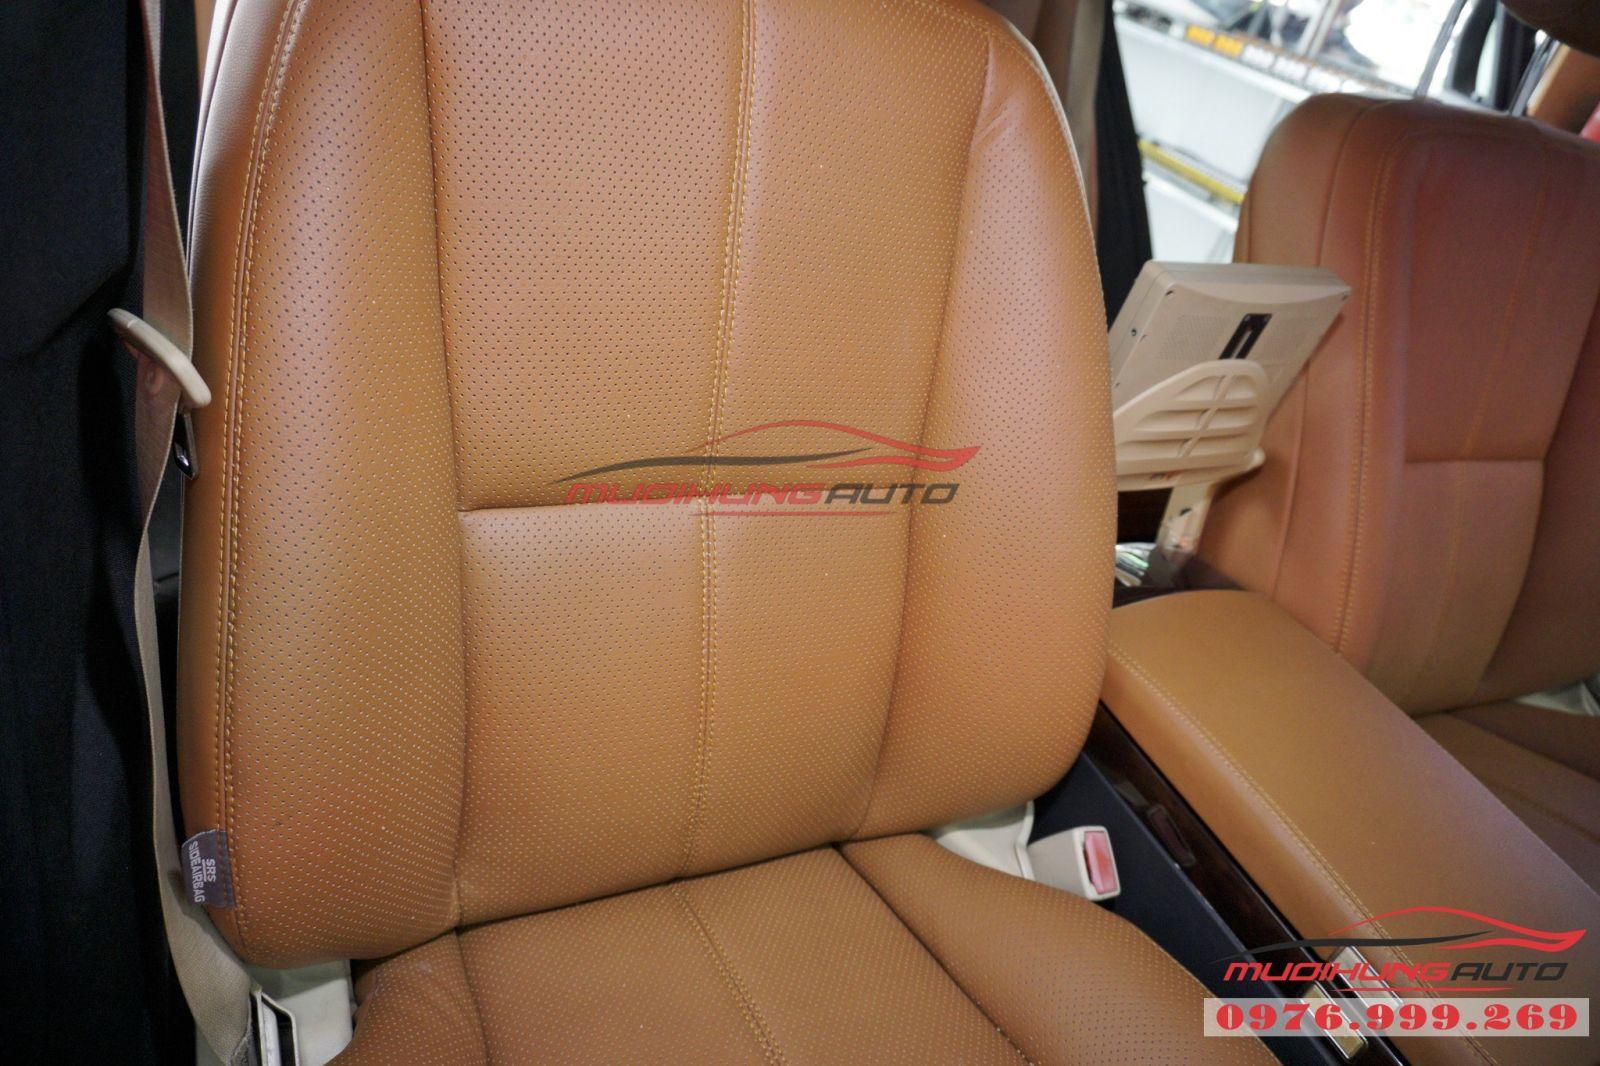 Bọc ghế da cao cấp cho Mercedes Benz giá tốt 07